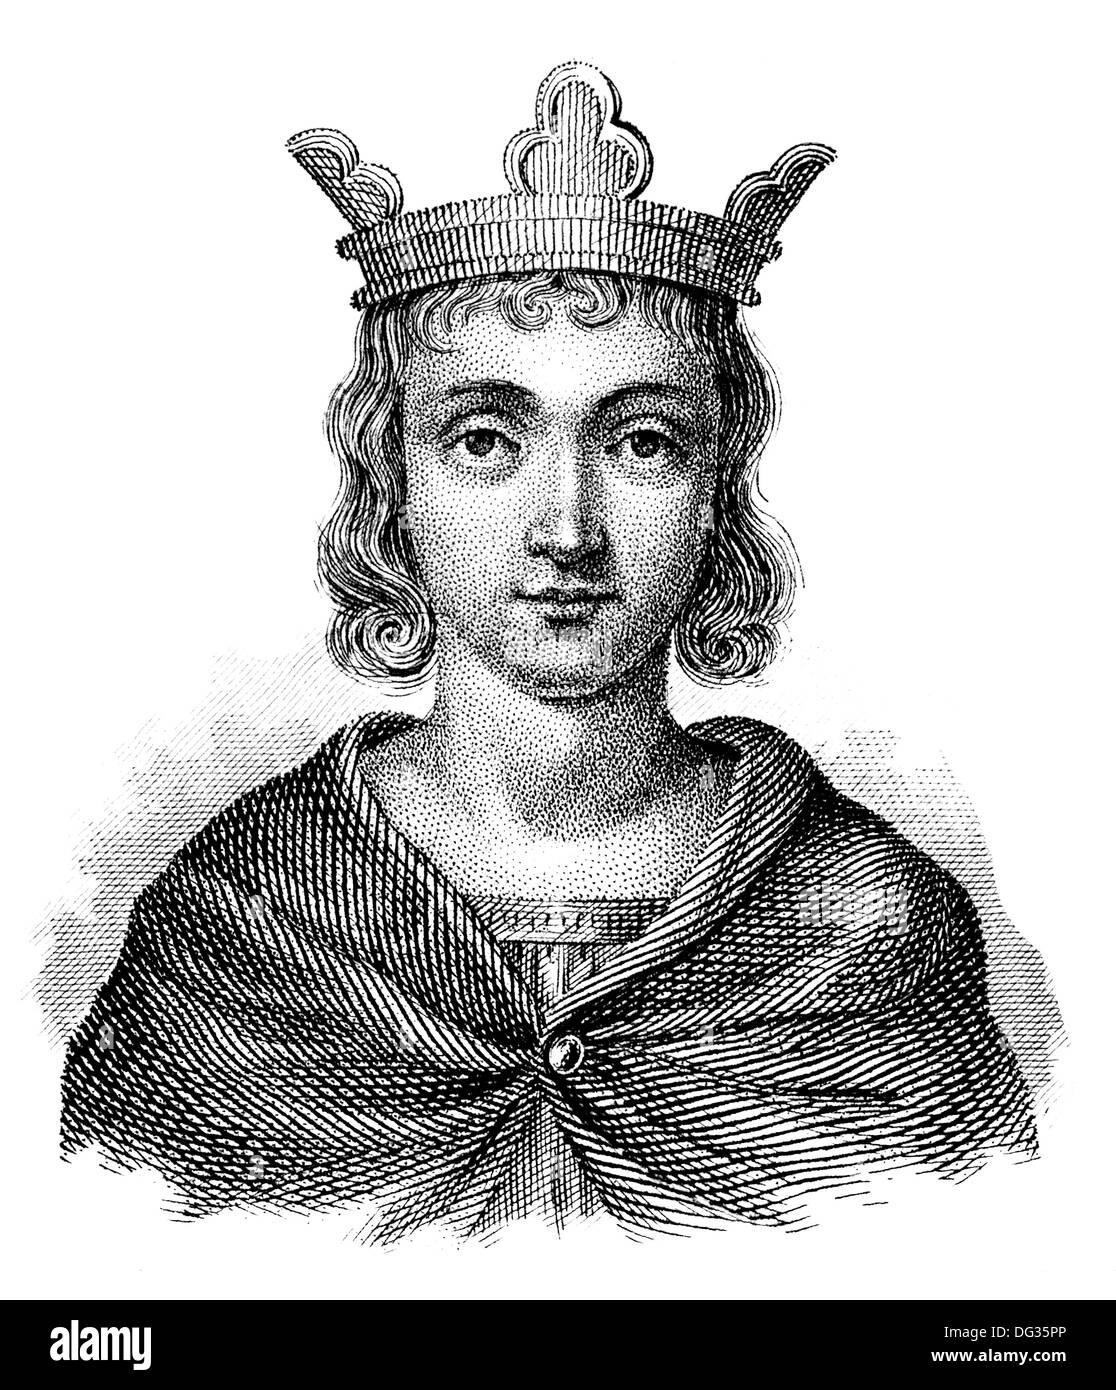 Conrad or Conradin, 1254-1268, the Duke of Swabia, as Conrad IV King of Jerusalem - Stock Image